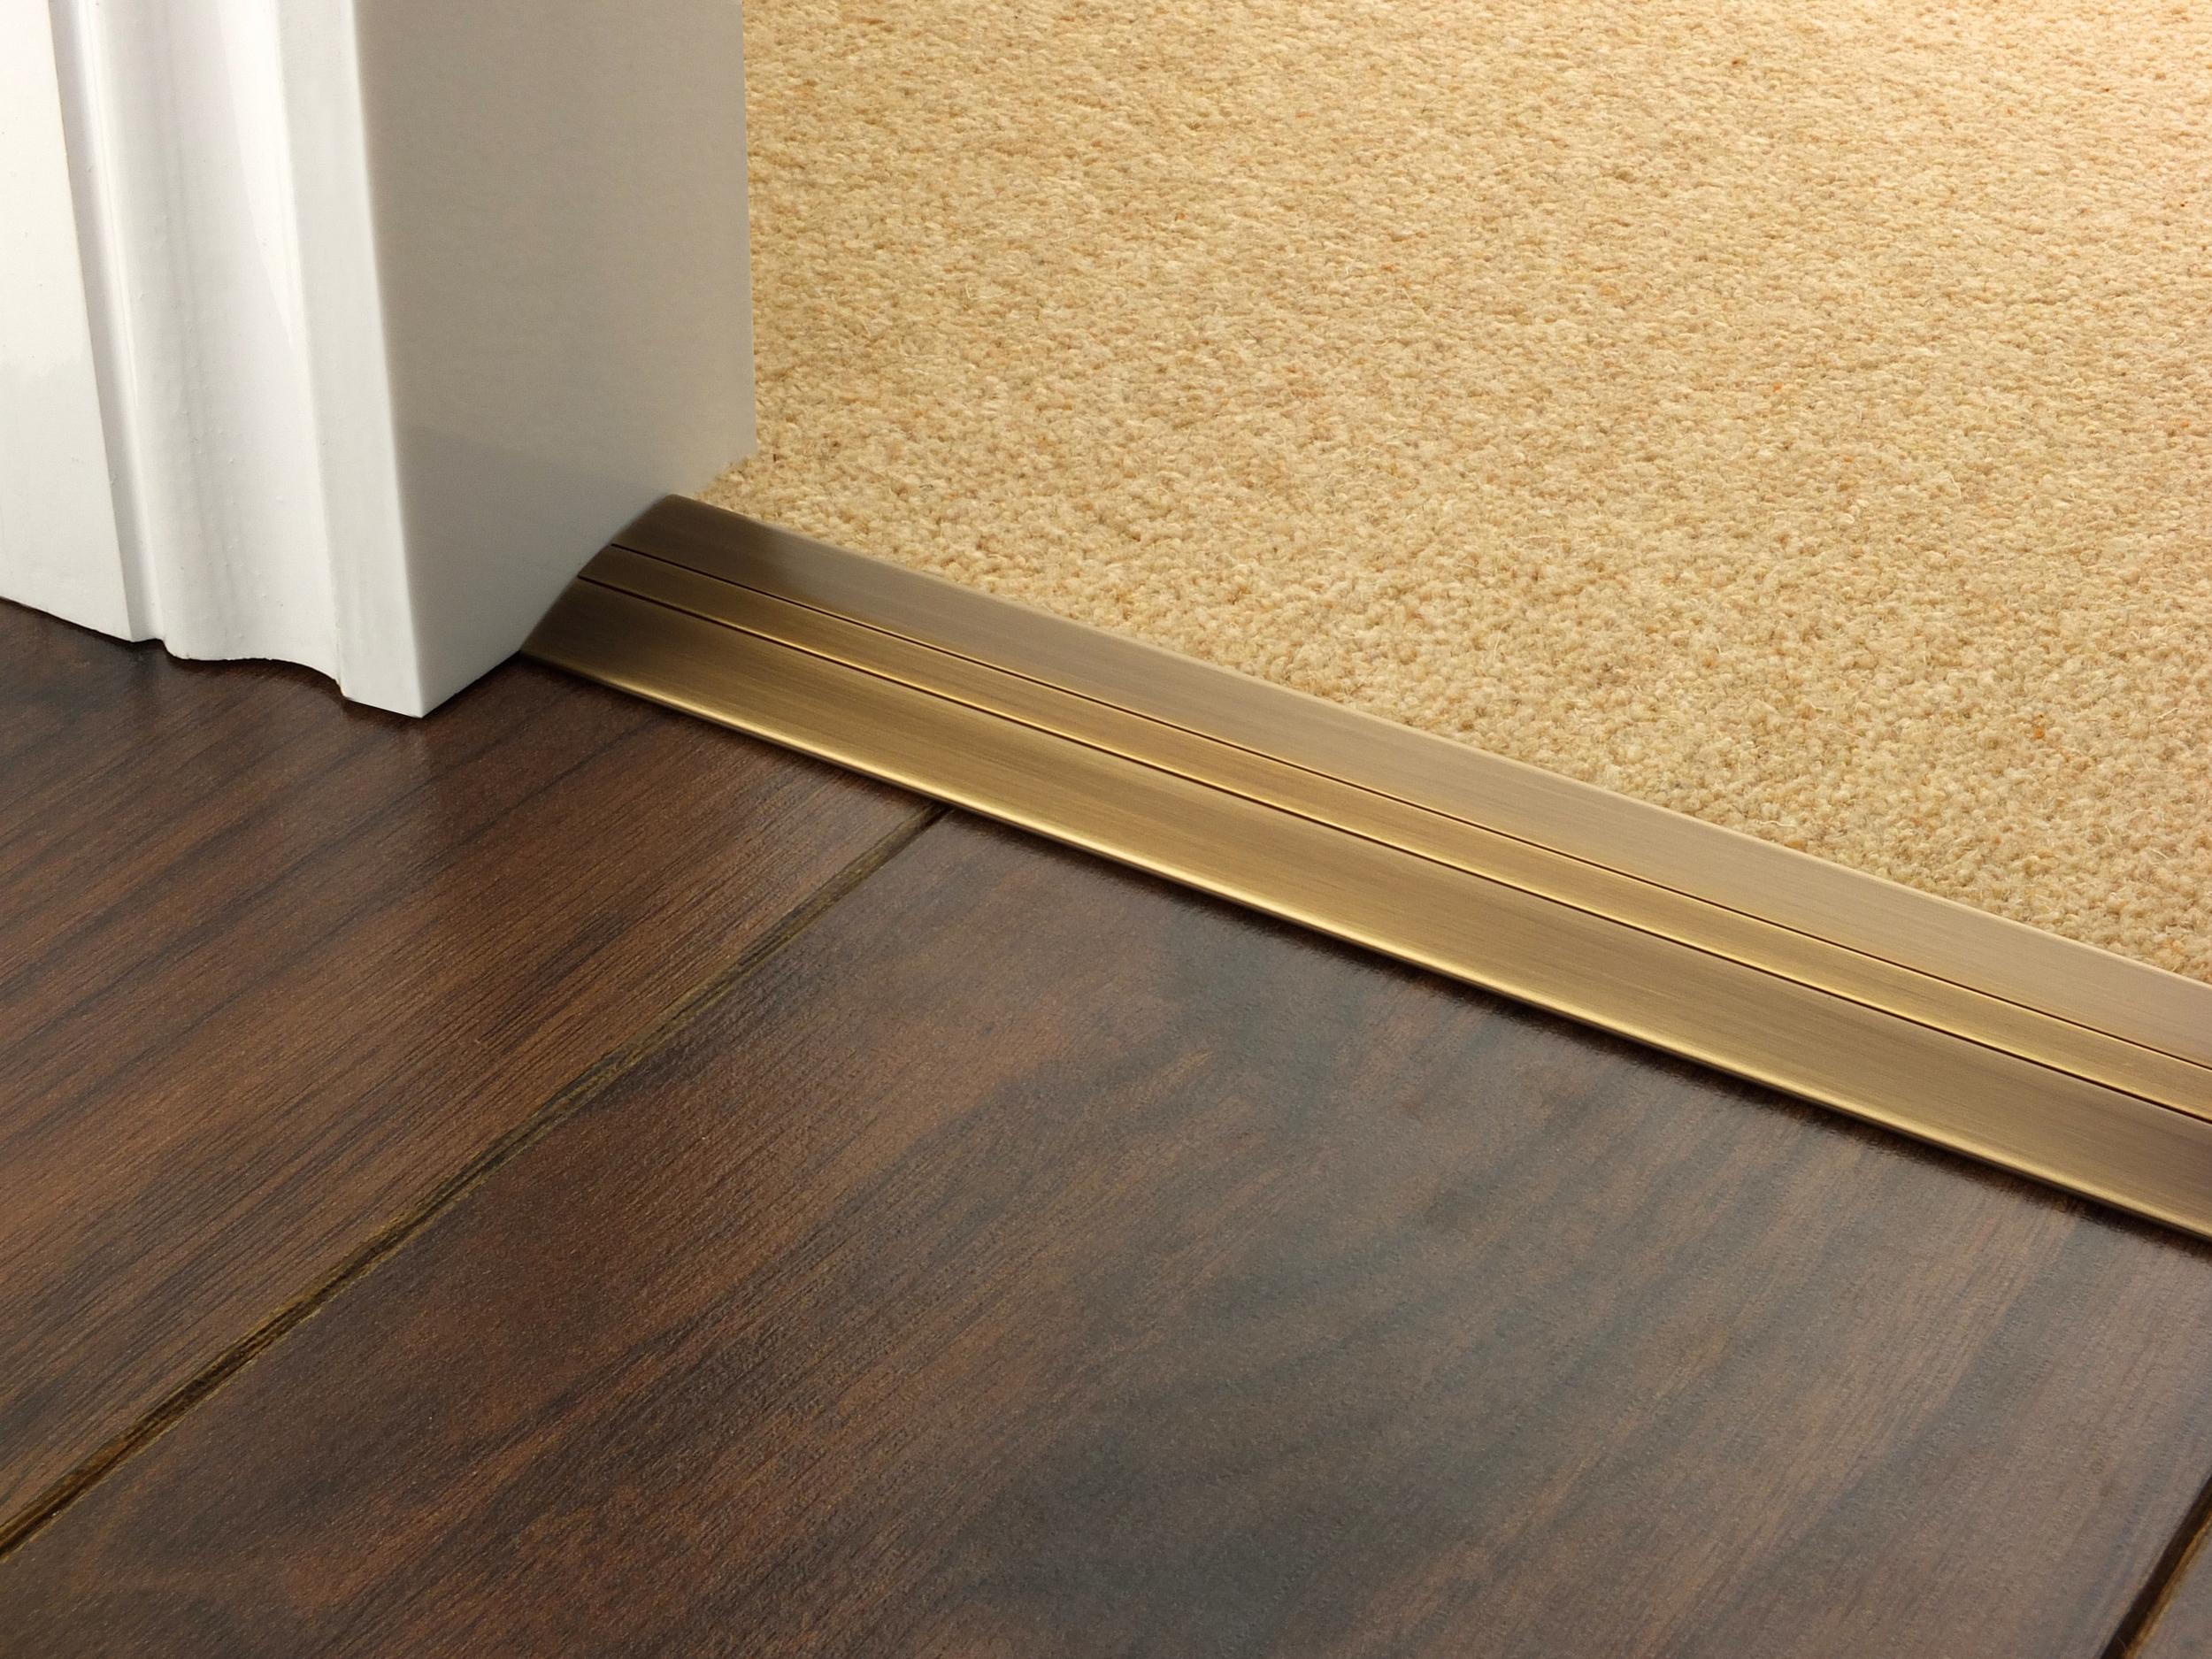 door_bar_antique_brass_posh_38_carpet_laminate.jpg